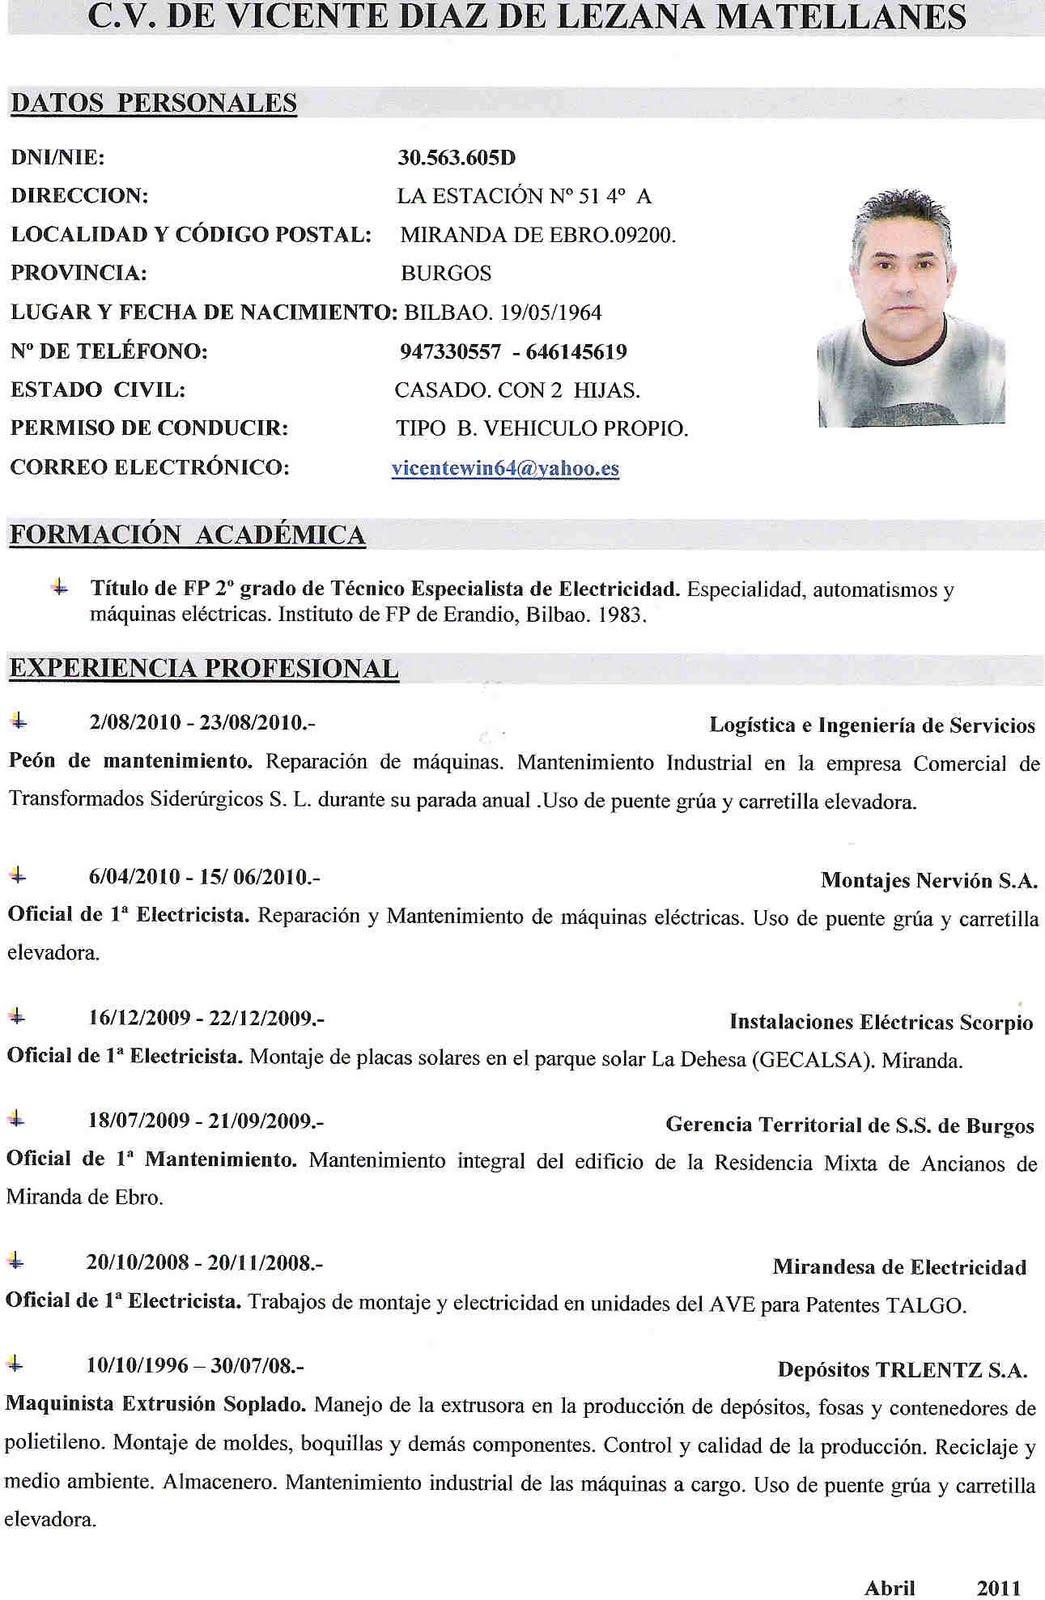 Dissertation romantisme introduction image 2